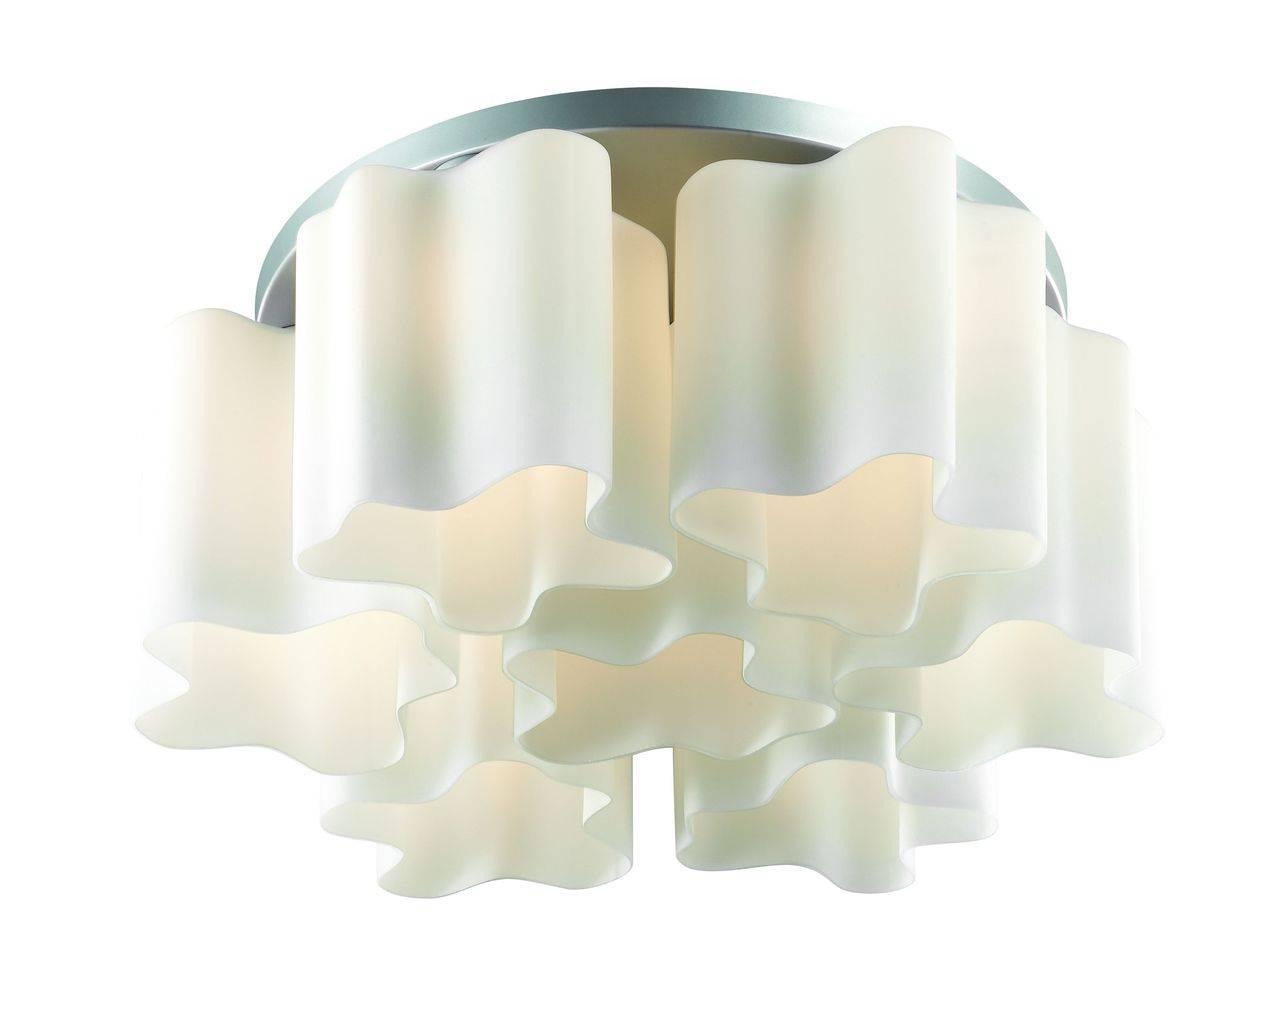 Потолочный светильник ST Luce, E27, 420 Вт бра st luce onde e27 60w sl116 501 01